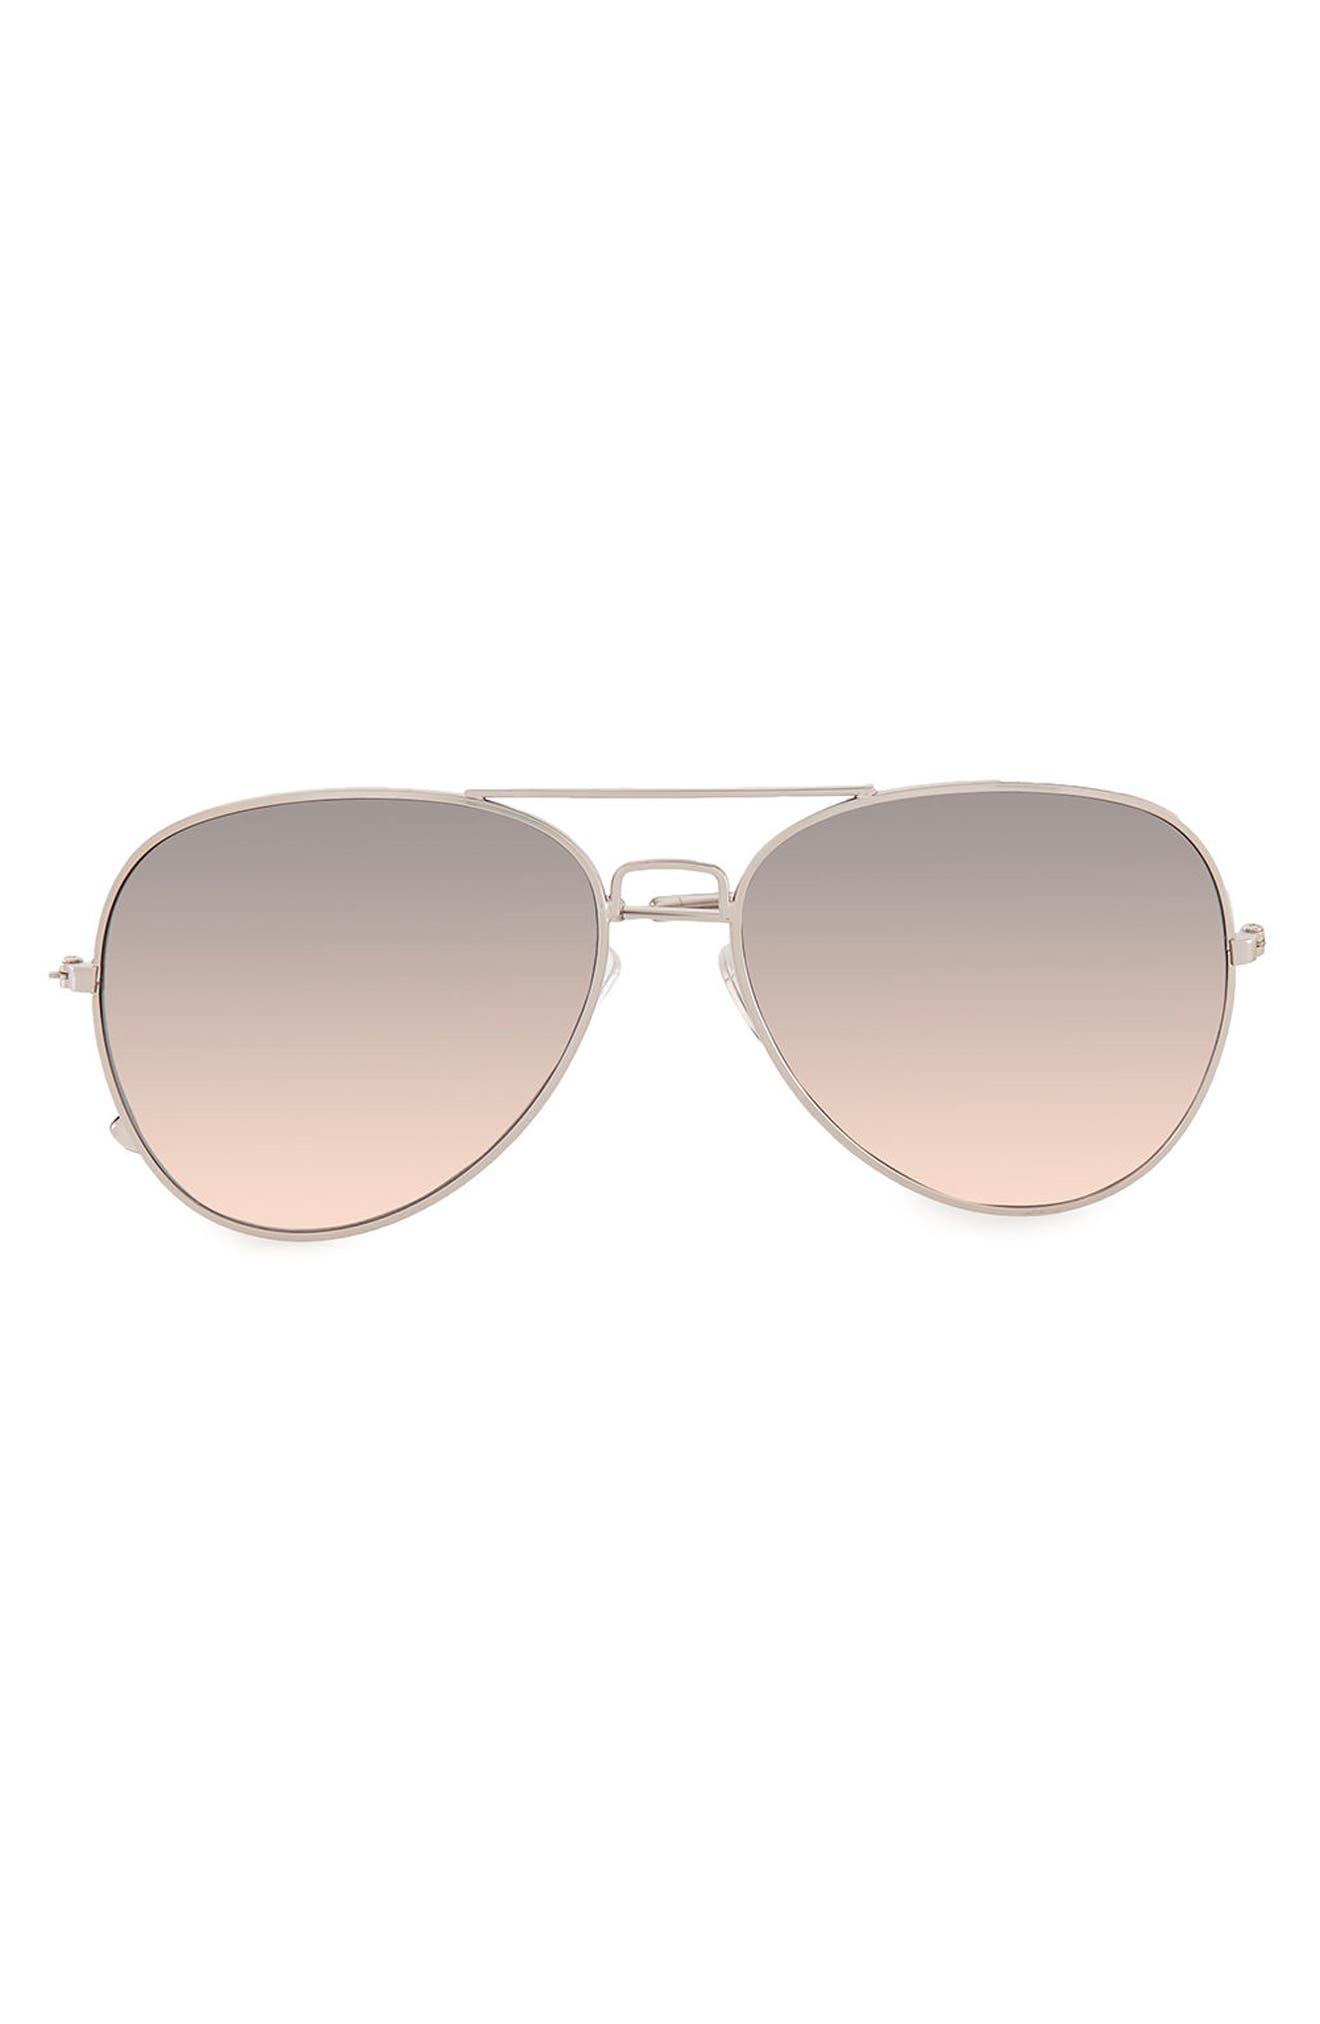 58mm Mirrored Aviator Sunglasses,                             Main thumbnail 1, color,                             Metallic Silver